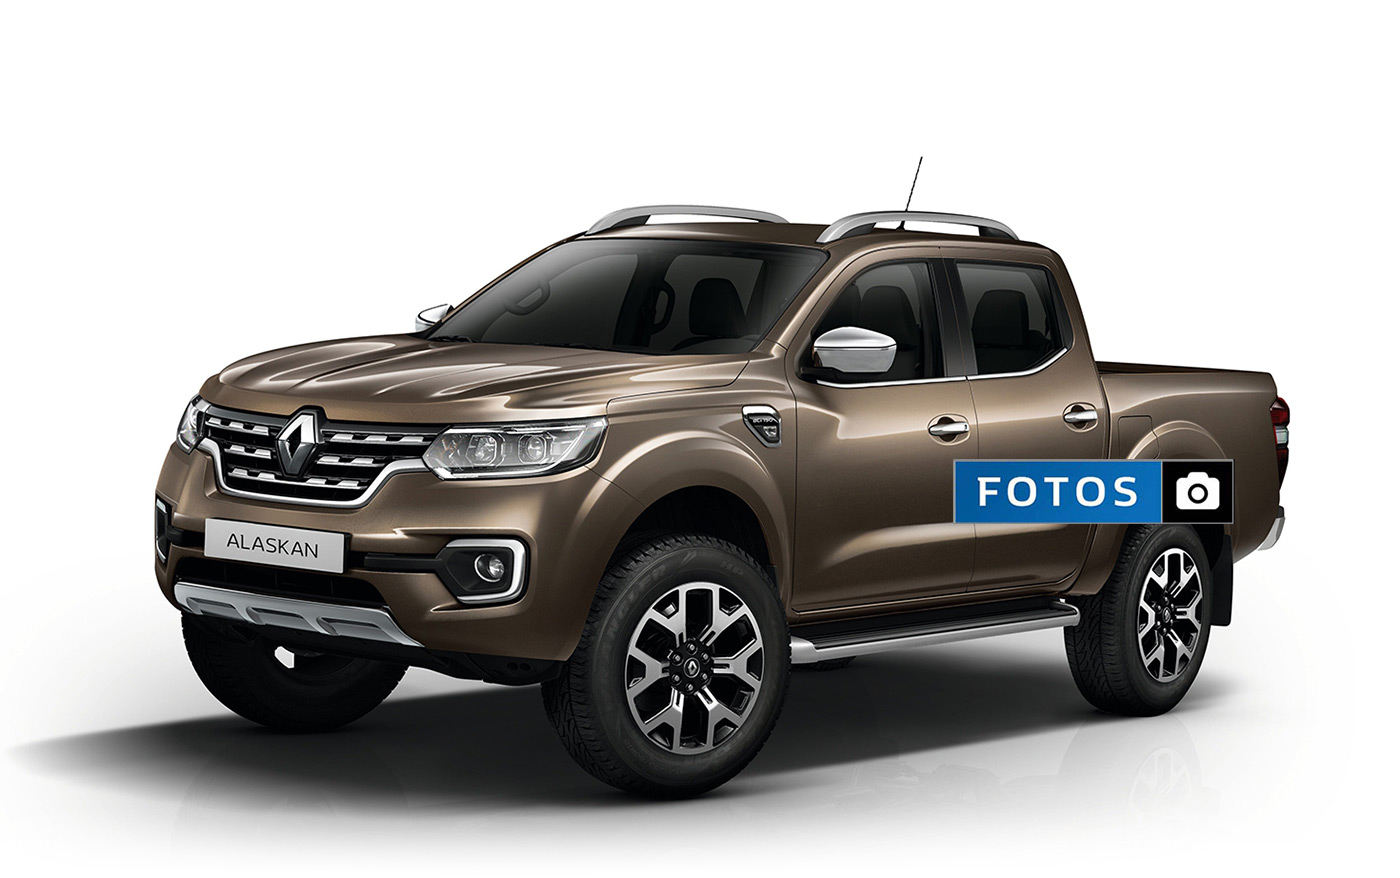 Renault Alaskan 2017: Angebot und Preis